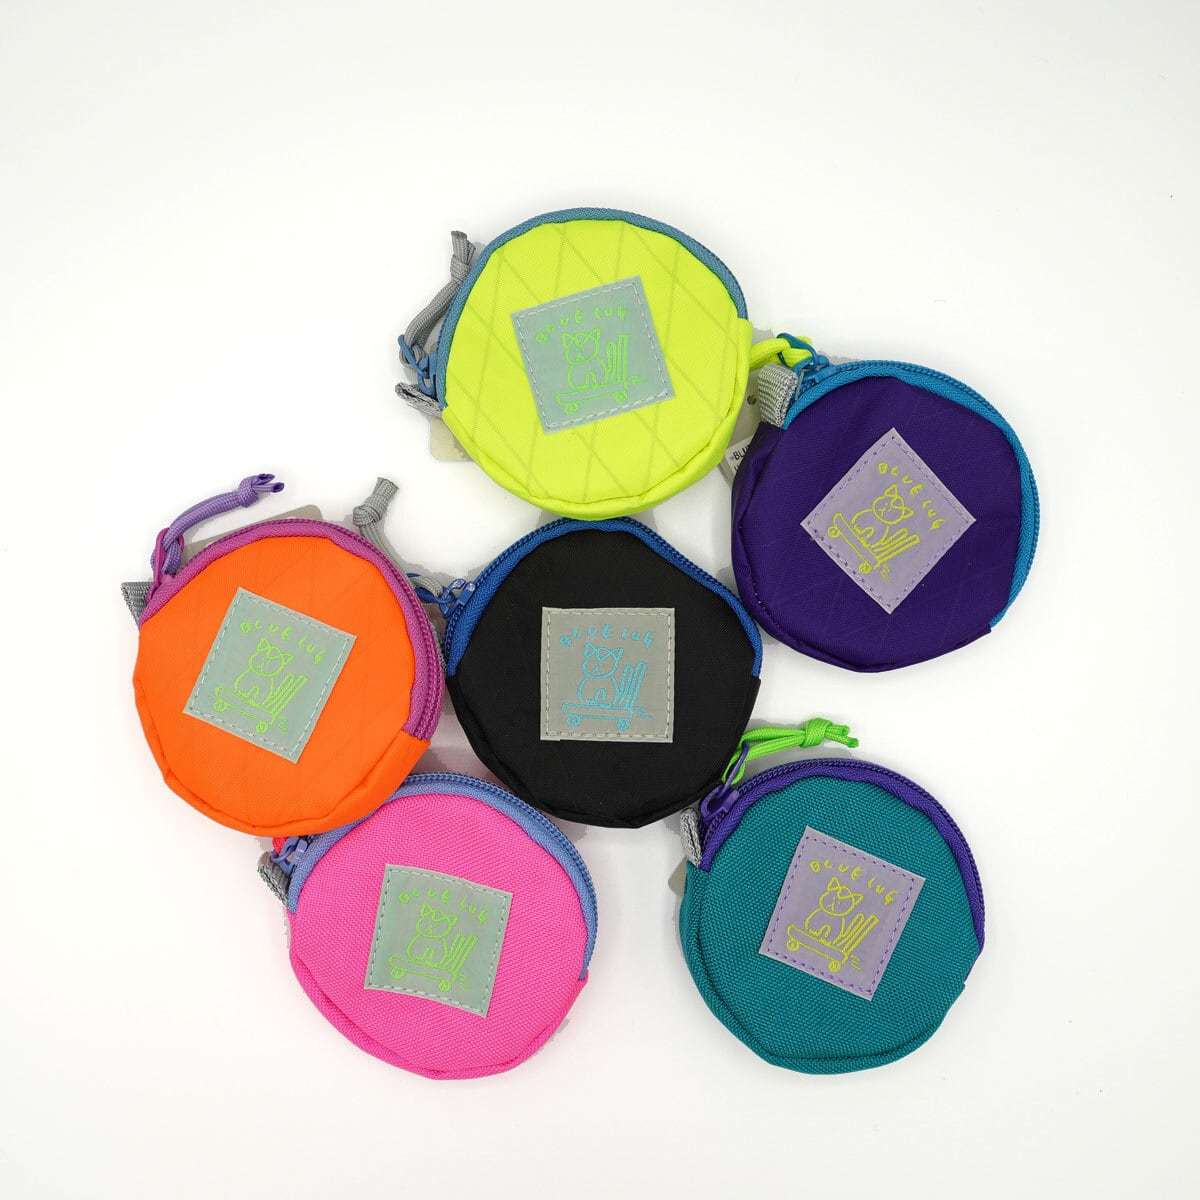 BLUE LUG coin pouch コインポーチ